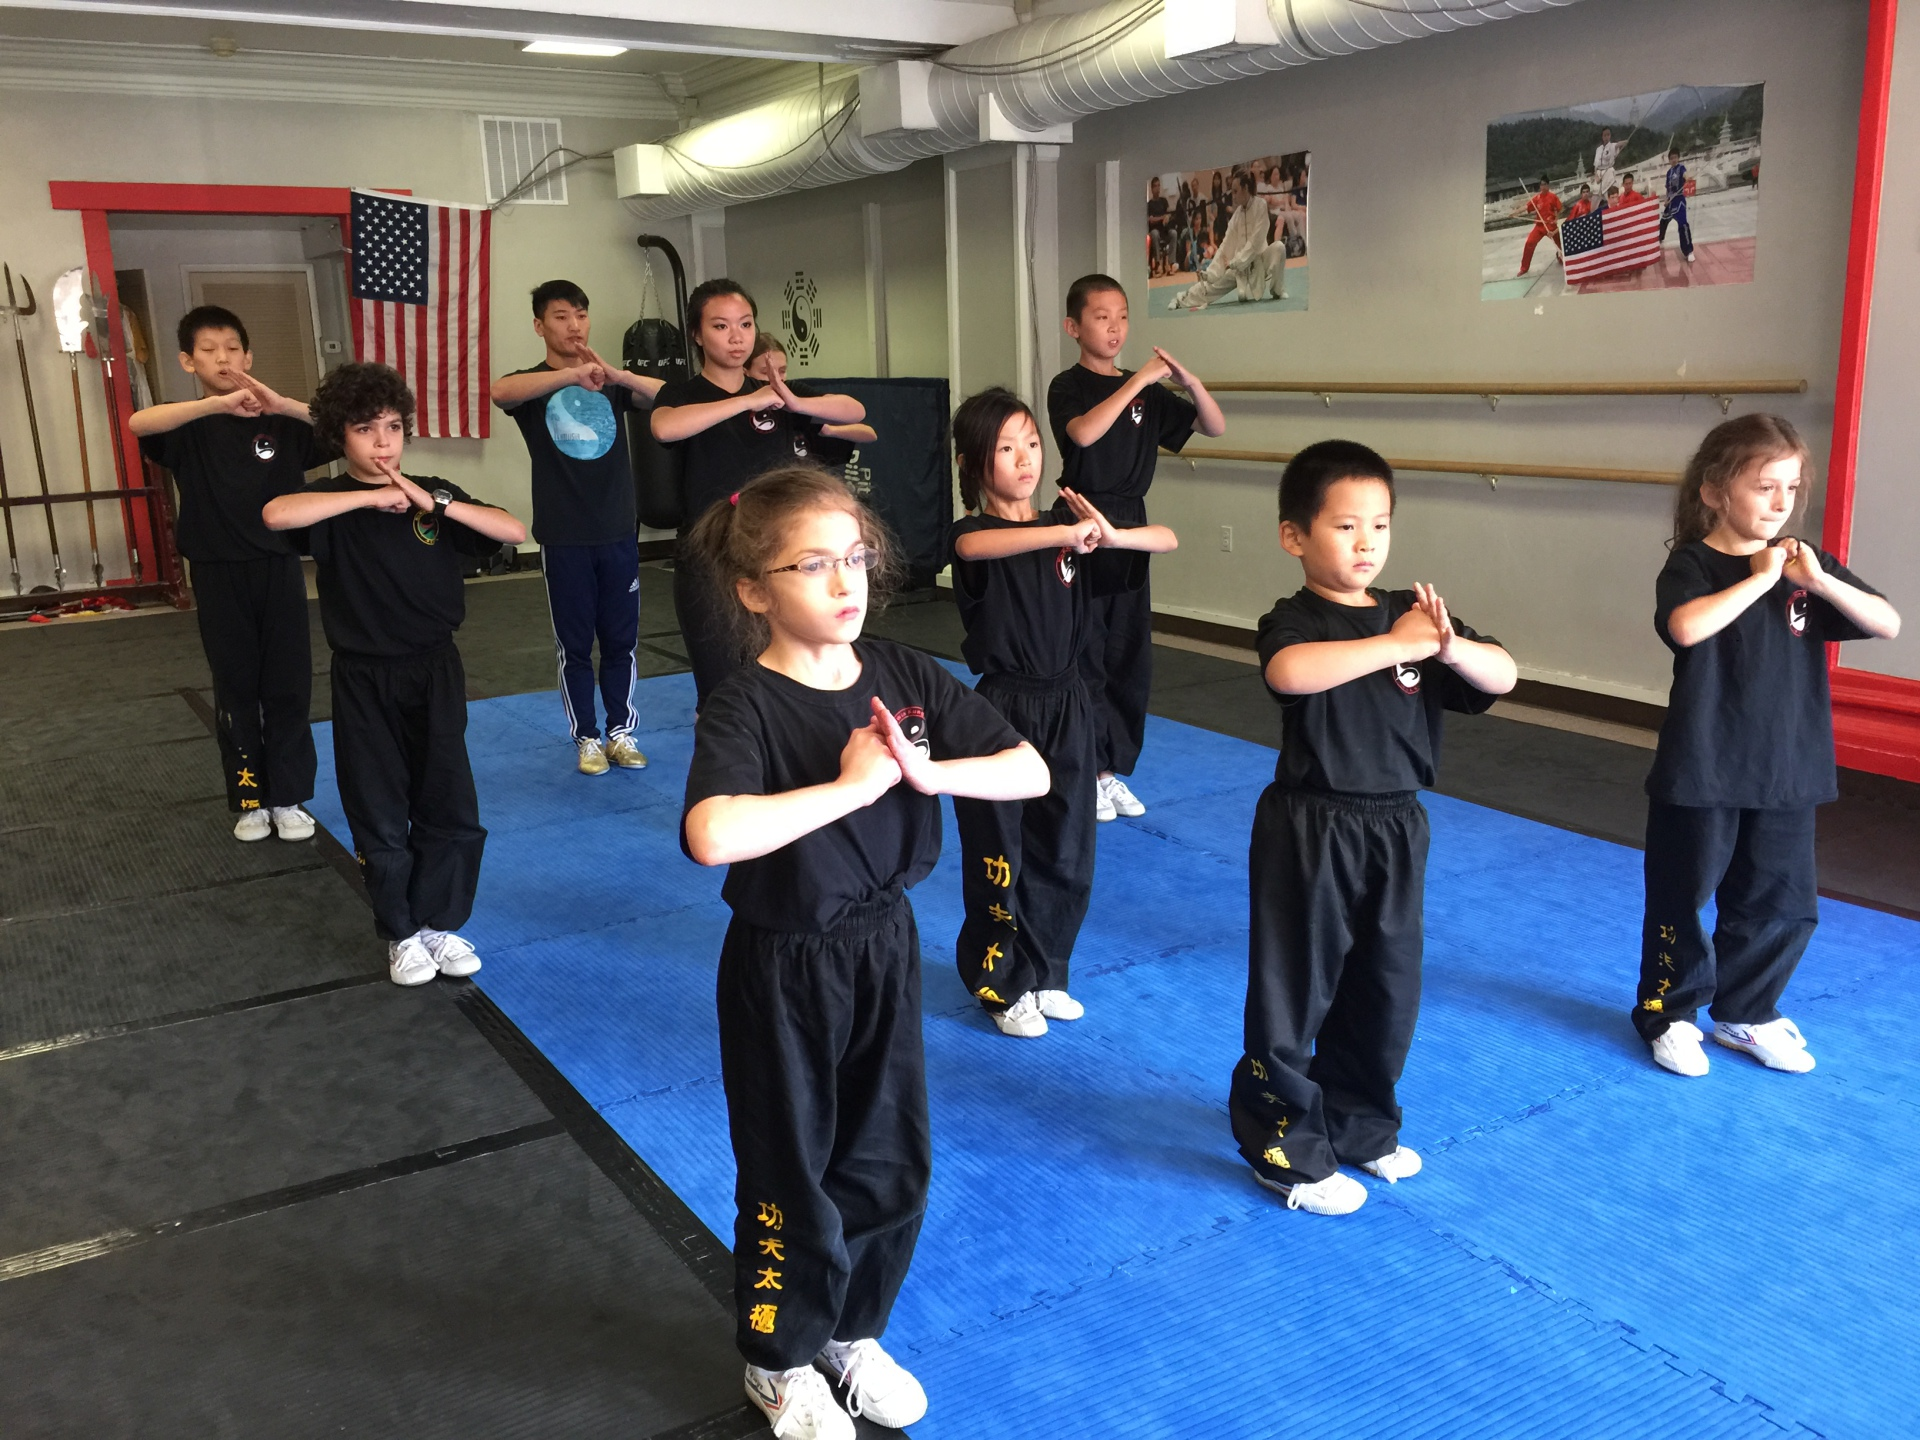 Wushu/kungfu classes